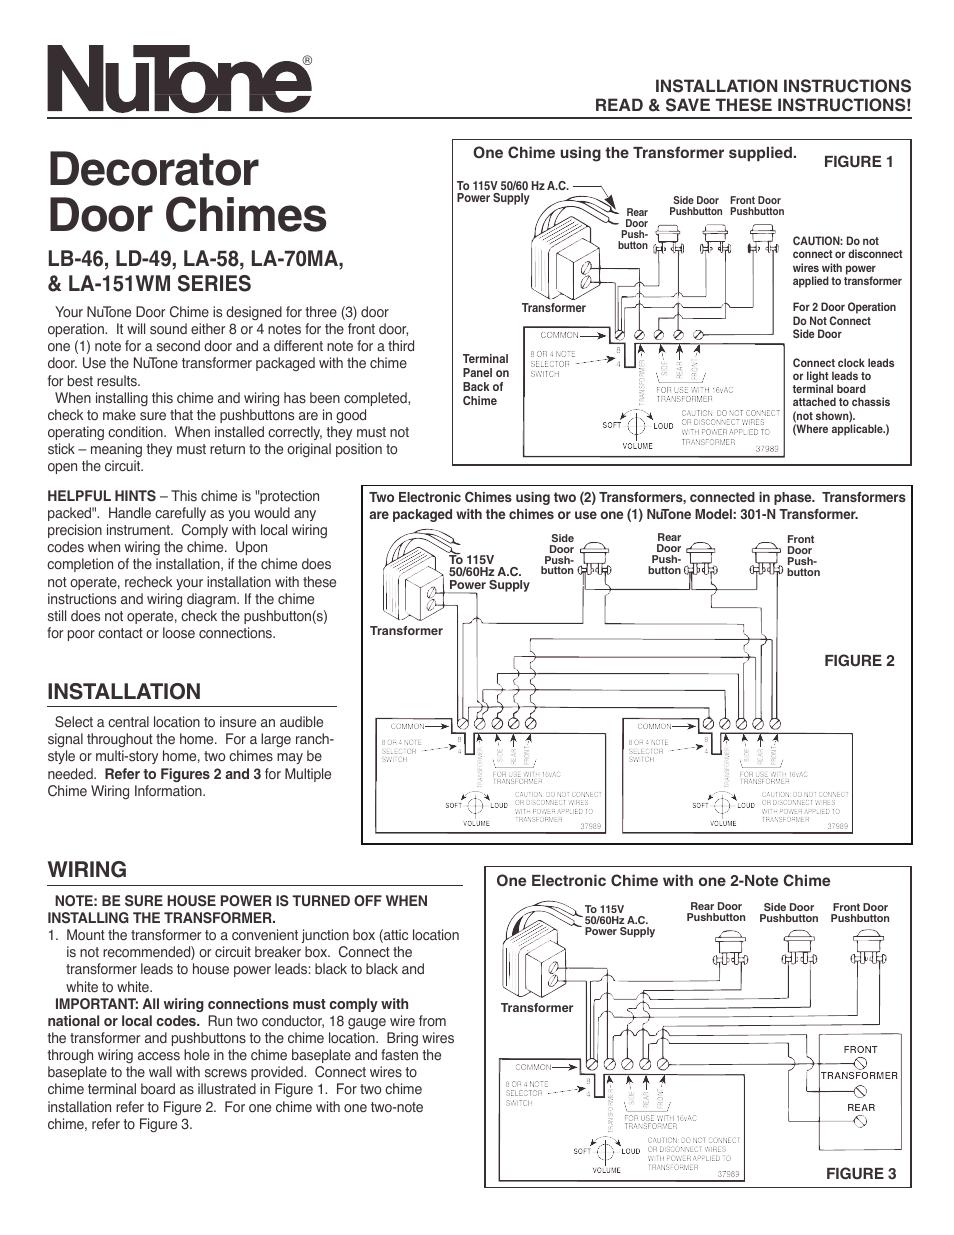 nutone decorator door chimes la 58 page1?resize\\\\\\\\\\\\\\\\\\\\\\\\\\\\\\\\\\\\\\\\\\\\\\\\\\\=665%2C861 ring doorbell wiring diagram doorbell transformer diagram \u2022 wiring Doorbell Wiring-Diagram Two Chimes at bayanpartner.co